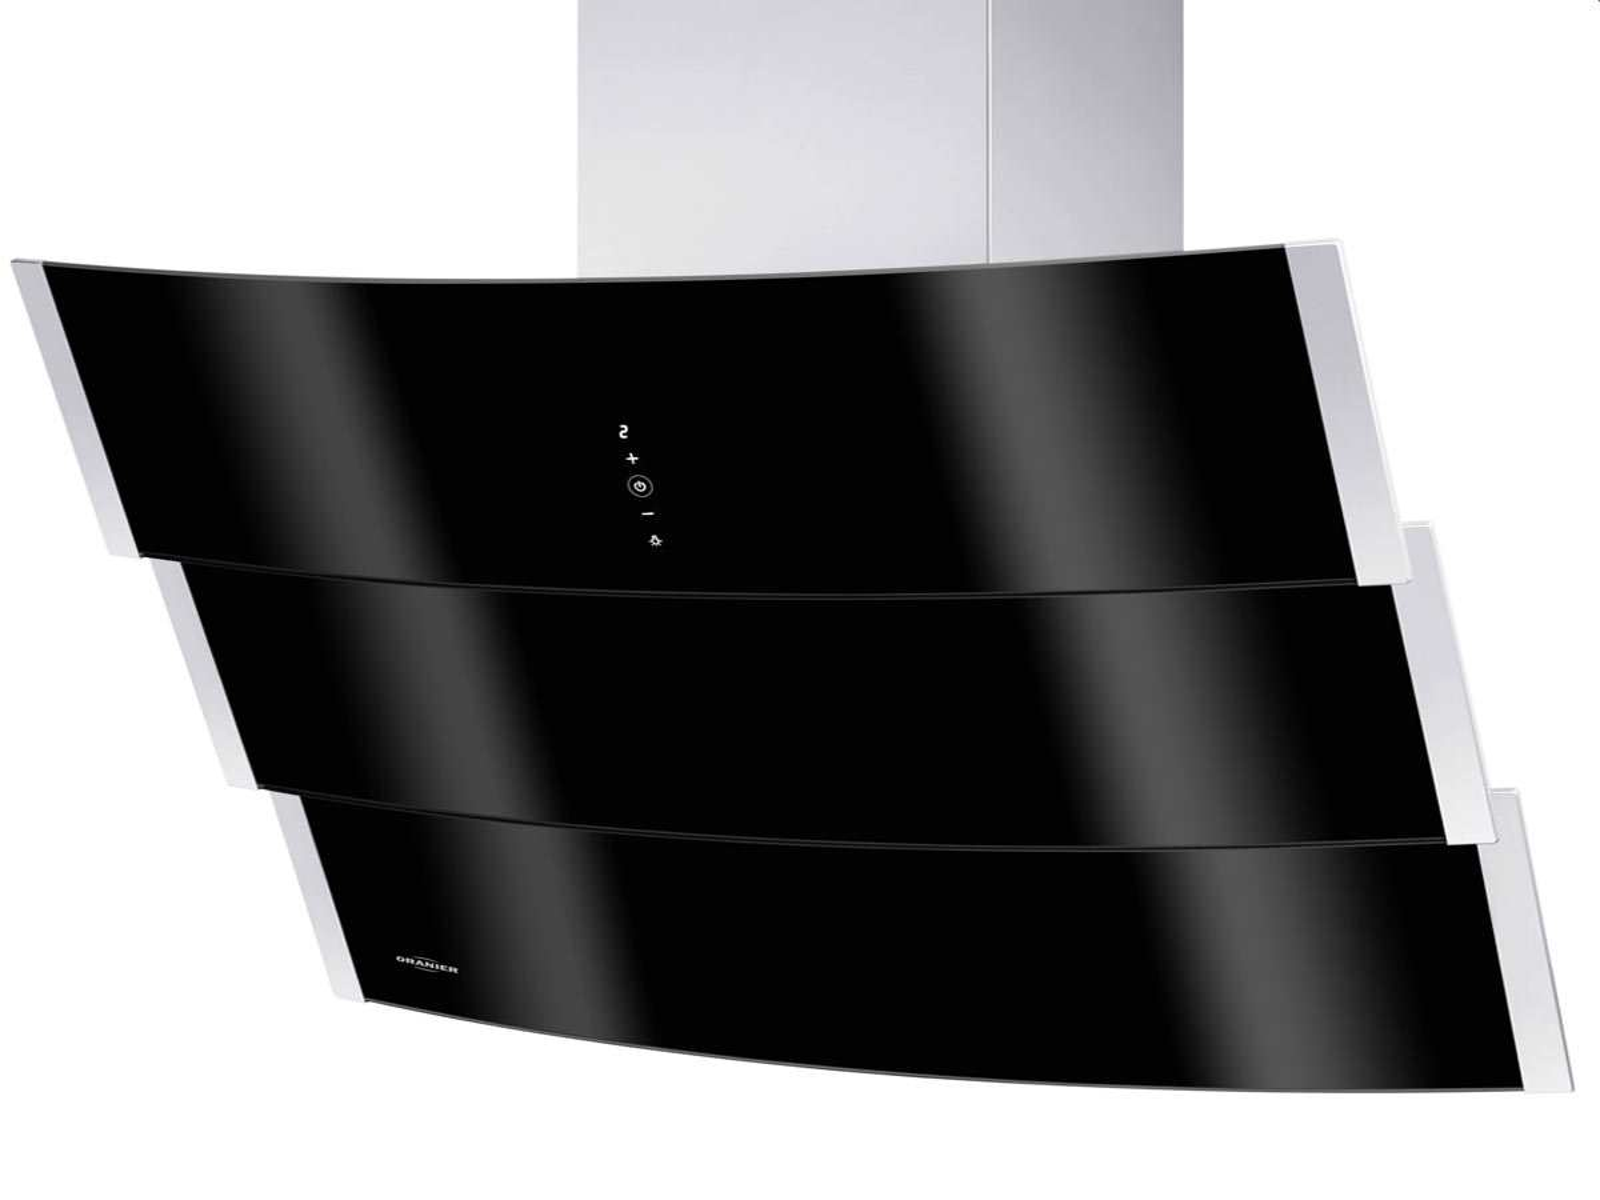 oranier livario 90 s 8614 90 kopffreihaube edelstahl schwarz. Black Bedroom Furniture Sets. Home Design Ideas